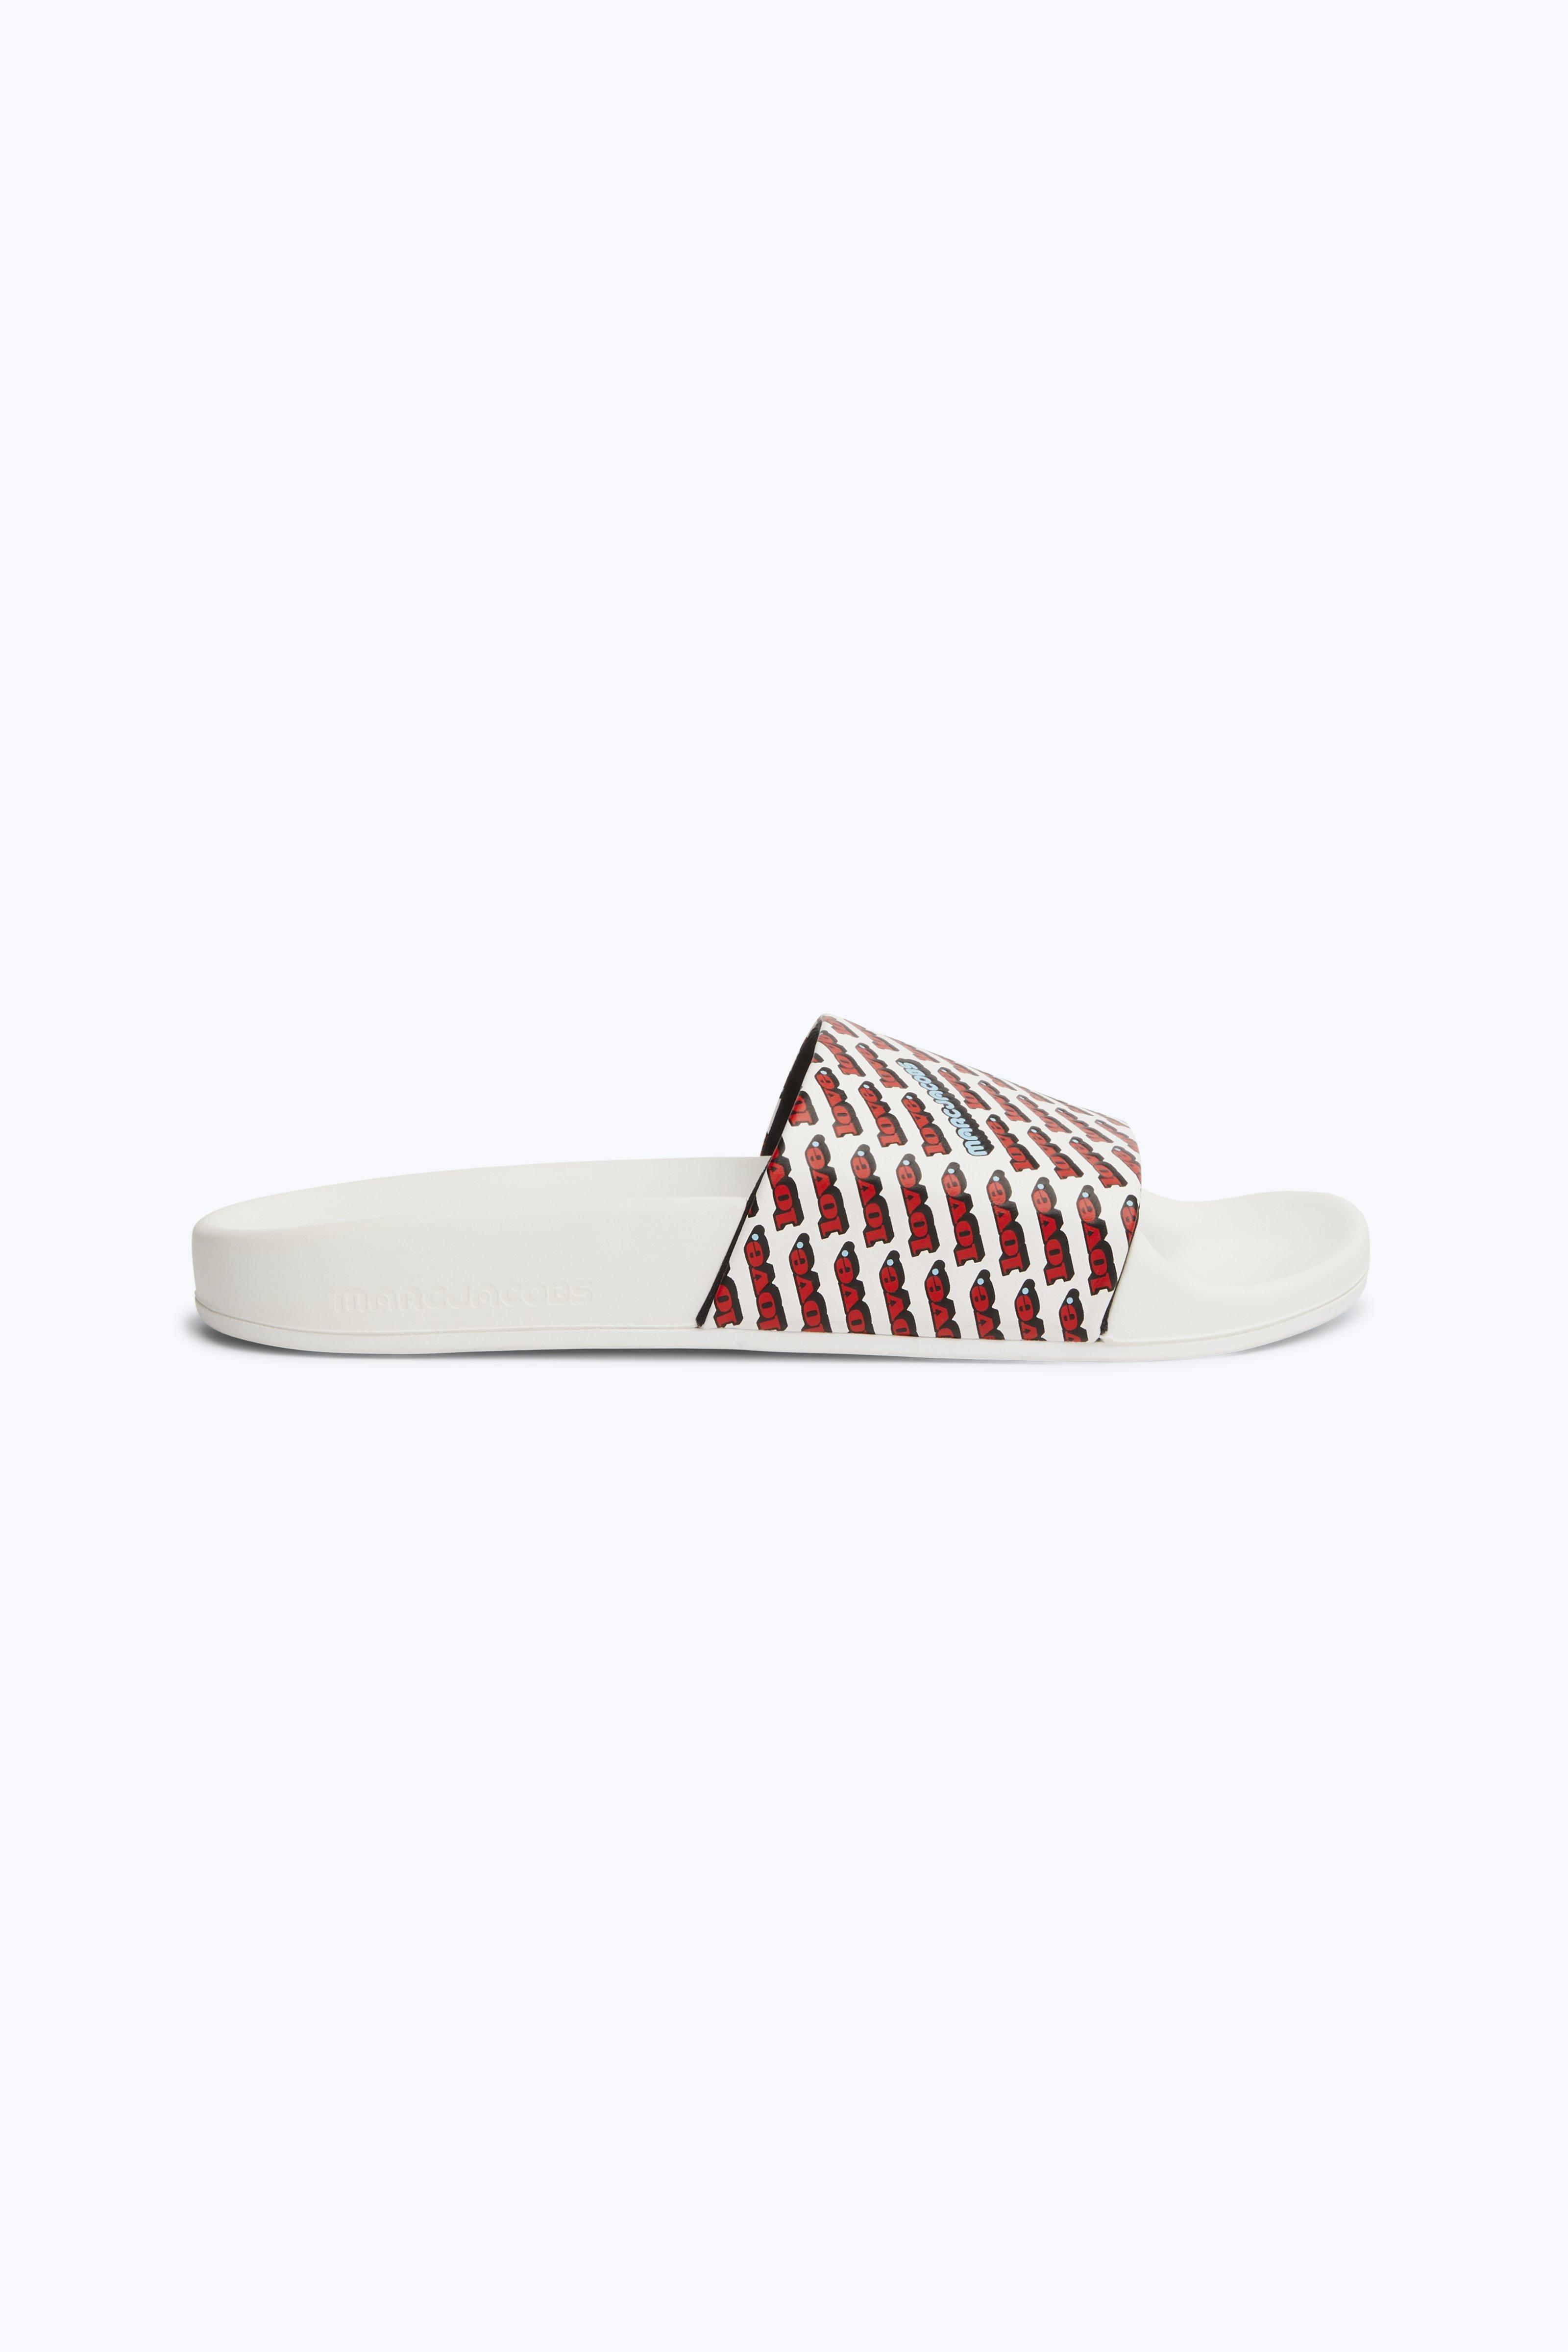 23cec2ff219e23 Marc Jacobs Women s Love Aqua Leather Slide Sandals In White